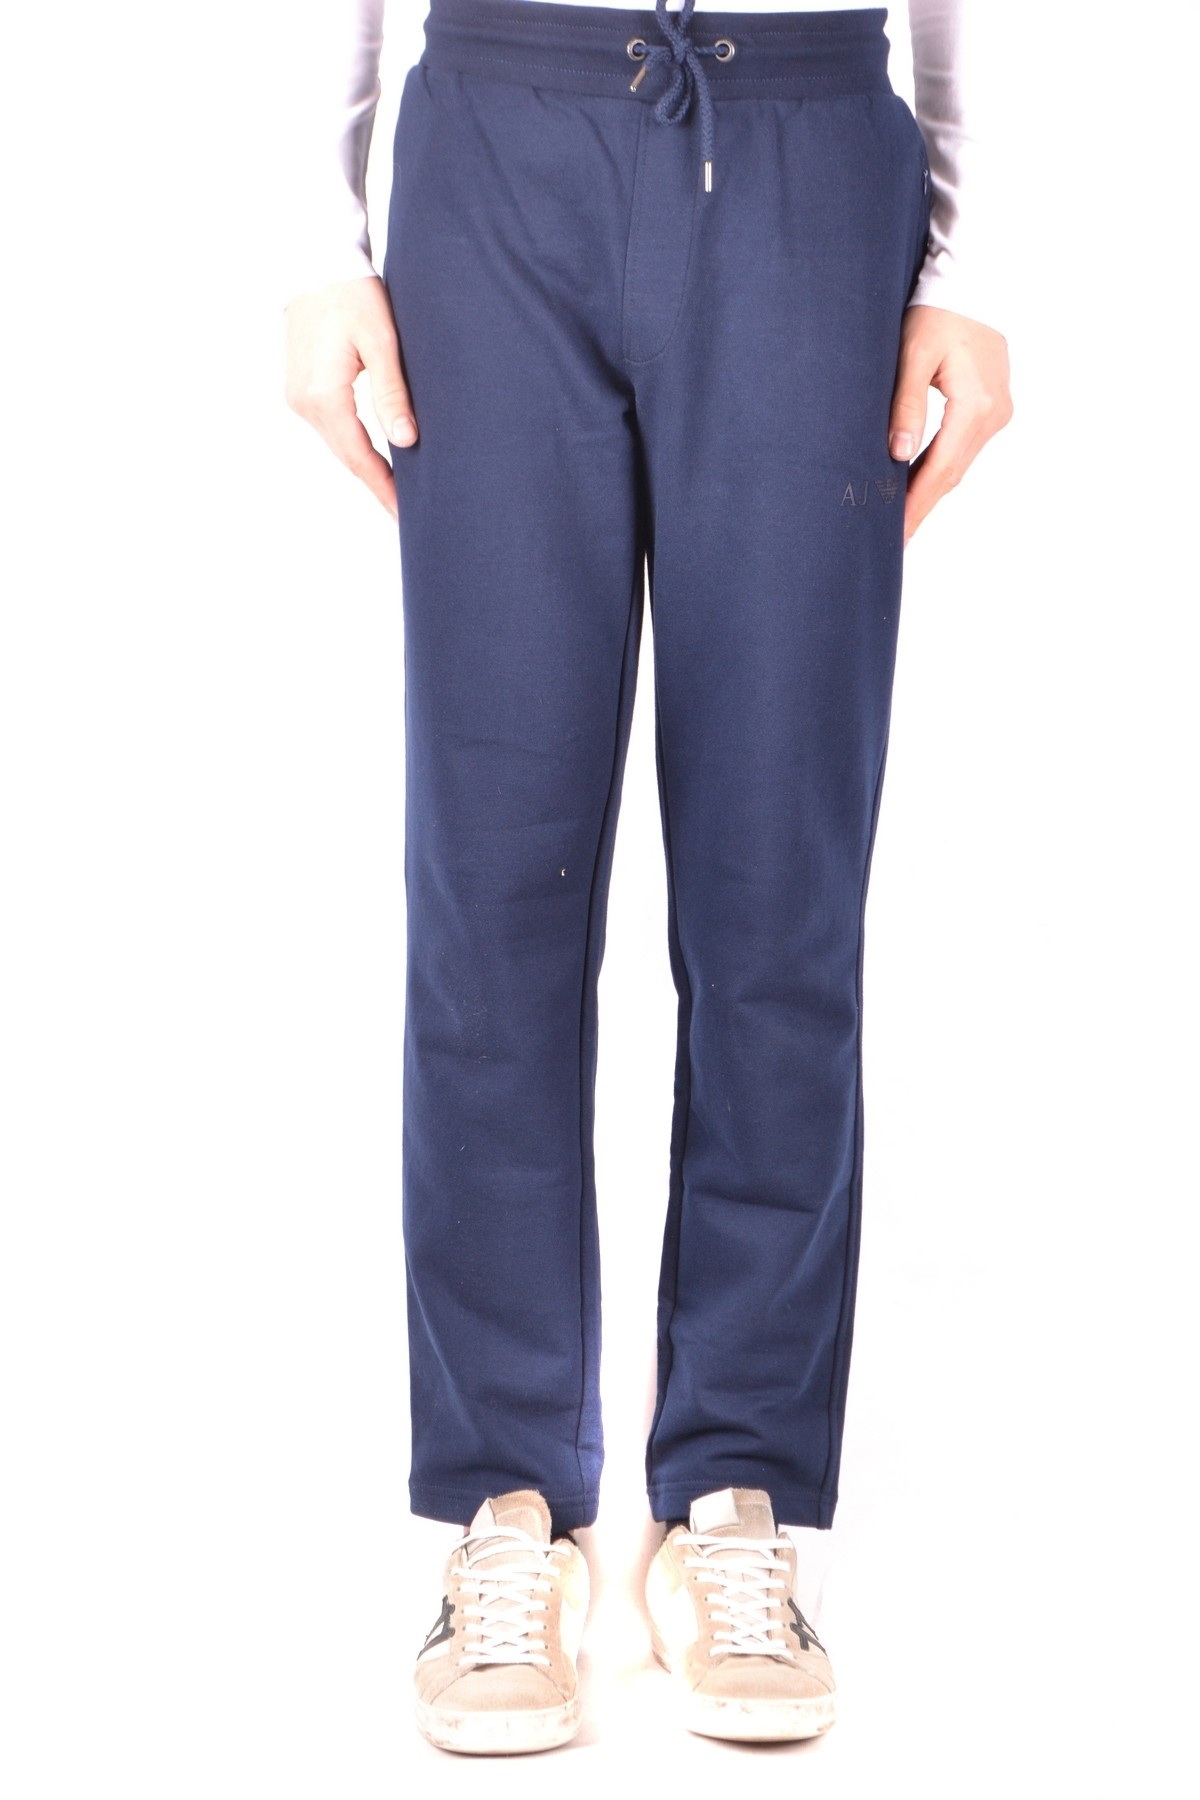 armani jeansMarchio: Armani Jeans; Genere: Uomo; Tipologia: T…